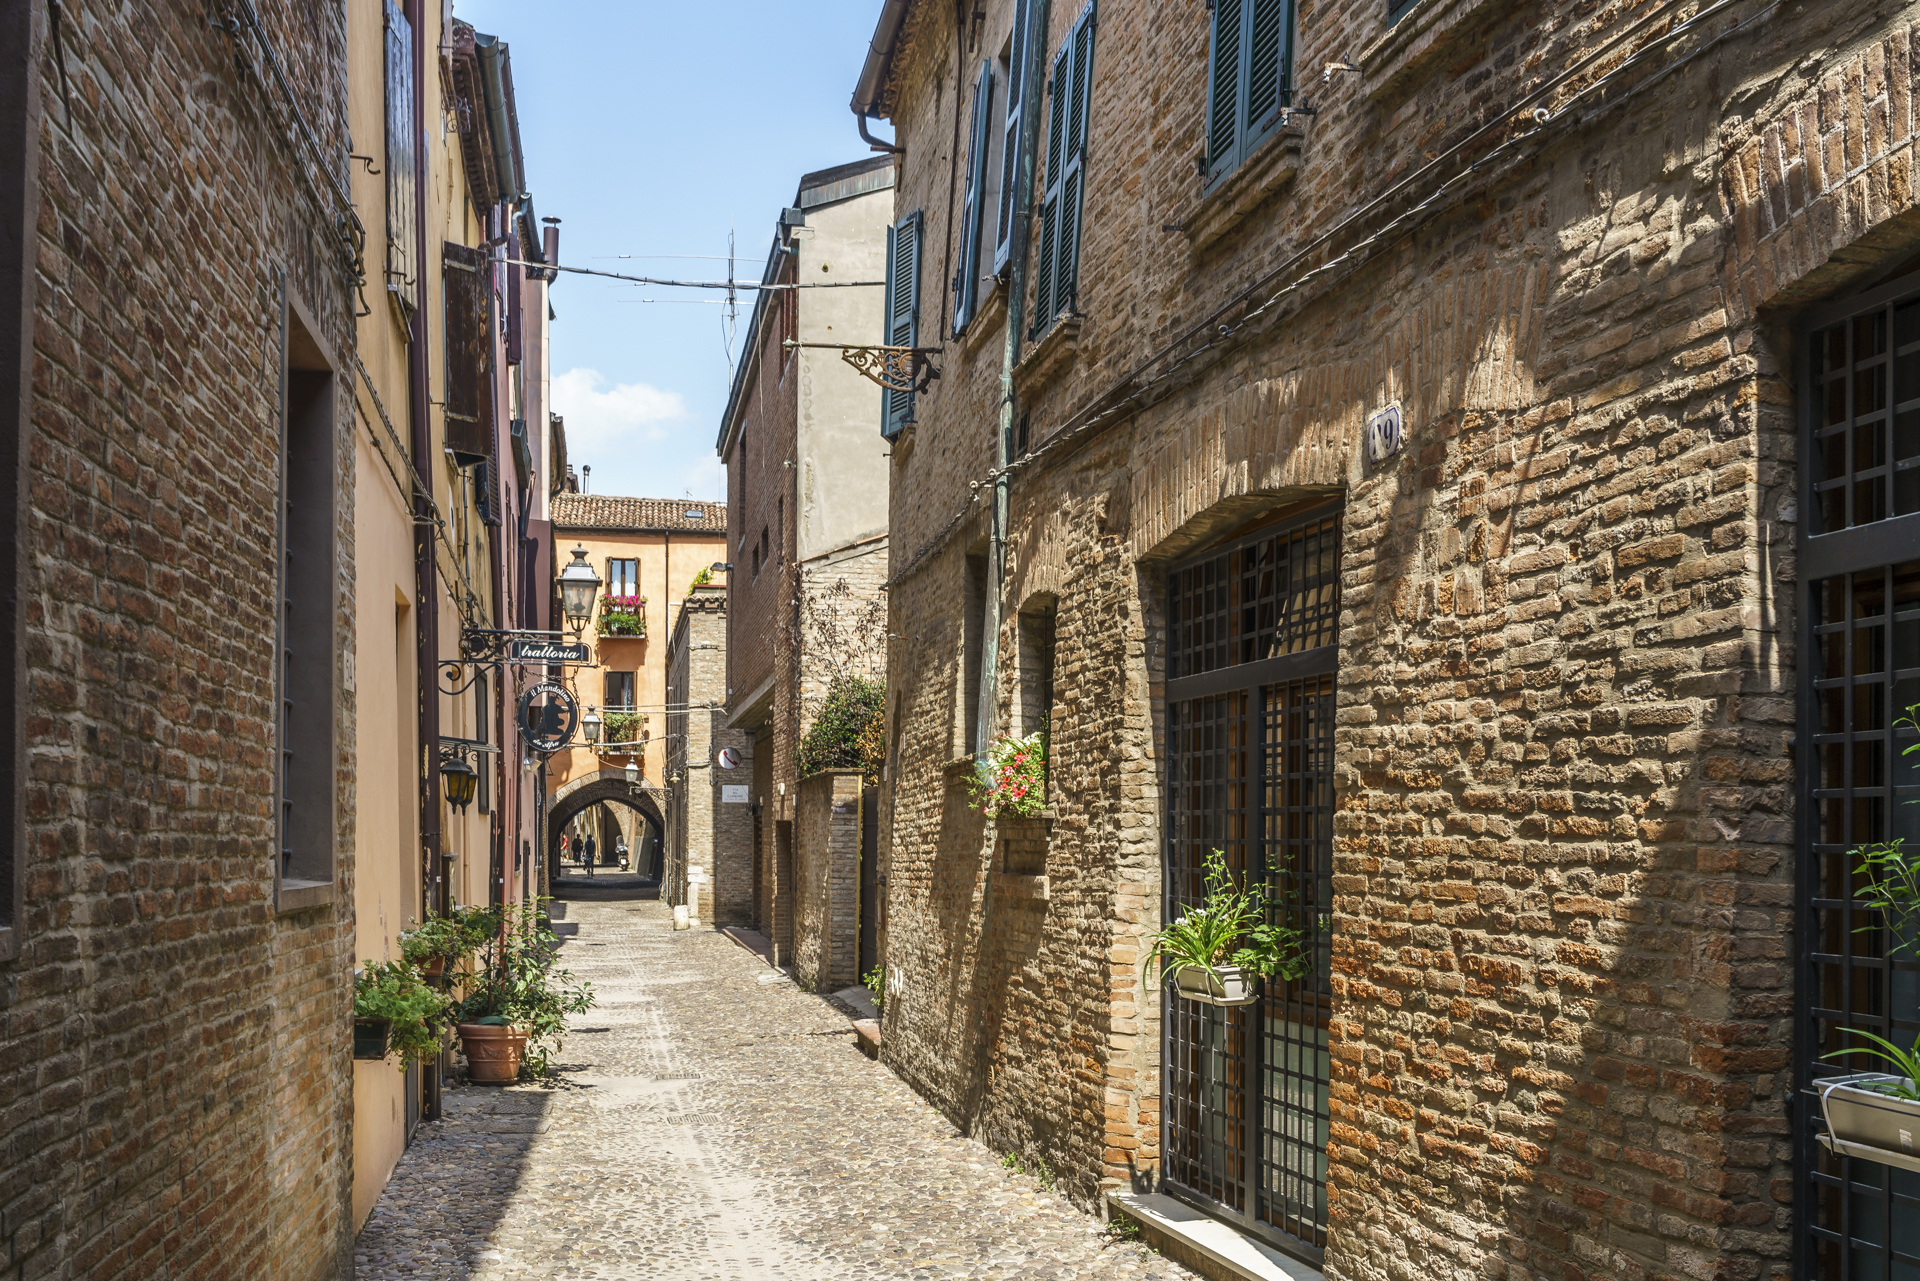 Trattoria-Volte-Street-Ferrara